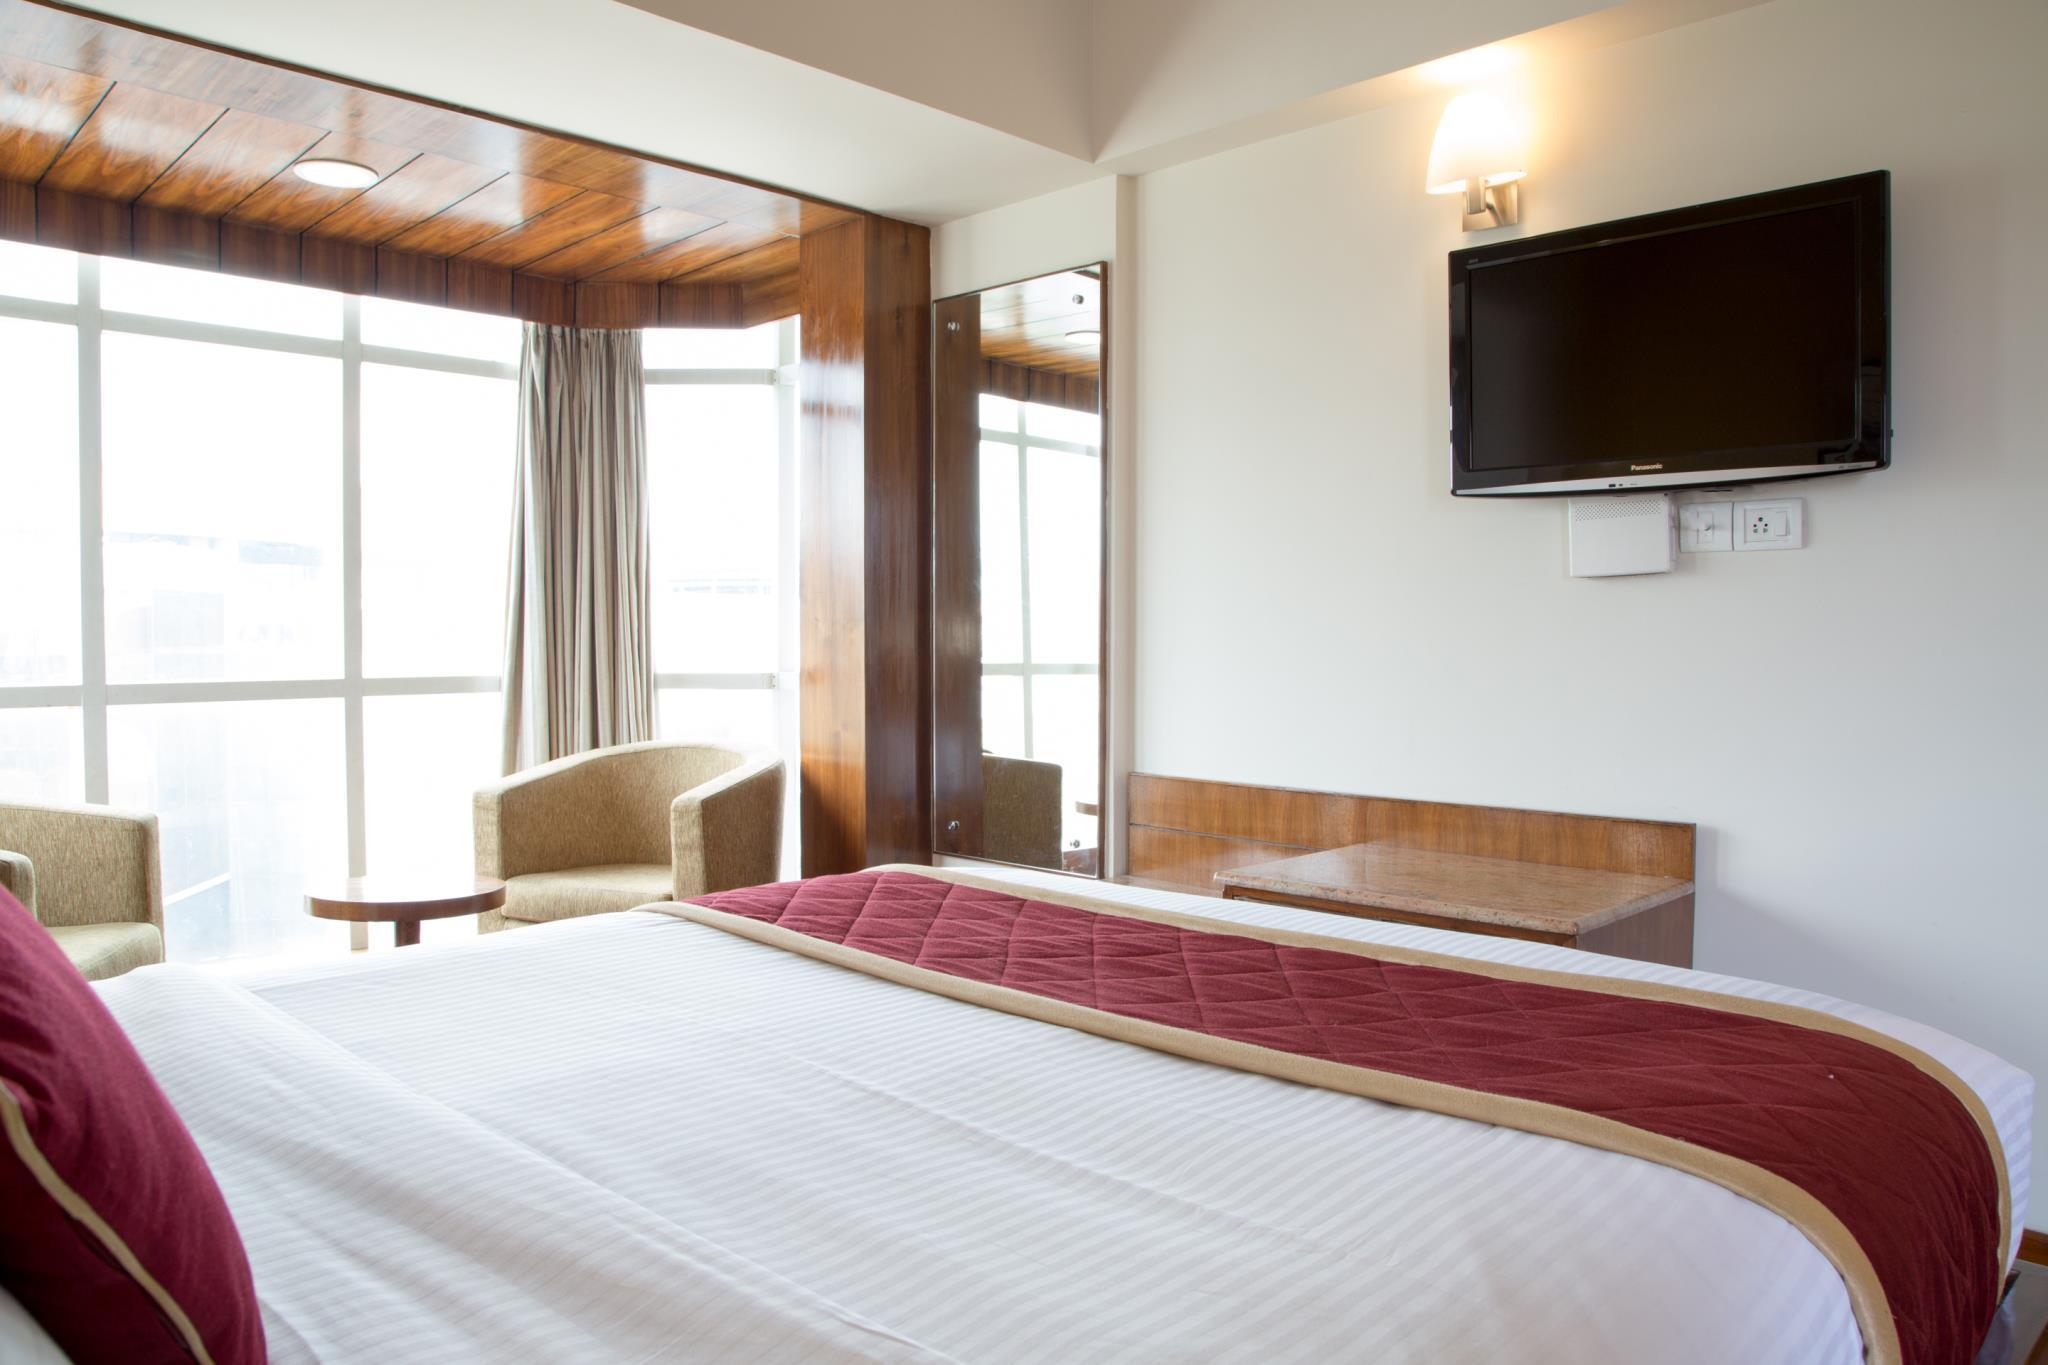 kitchen design bangalore drawers 班加罗尔新彩虹商务酒店 new rainbow business hotel 经济型 预订优惠 关于新彩虹商务酒店